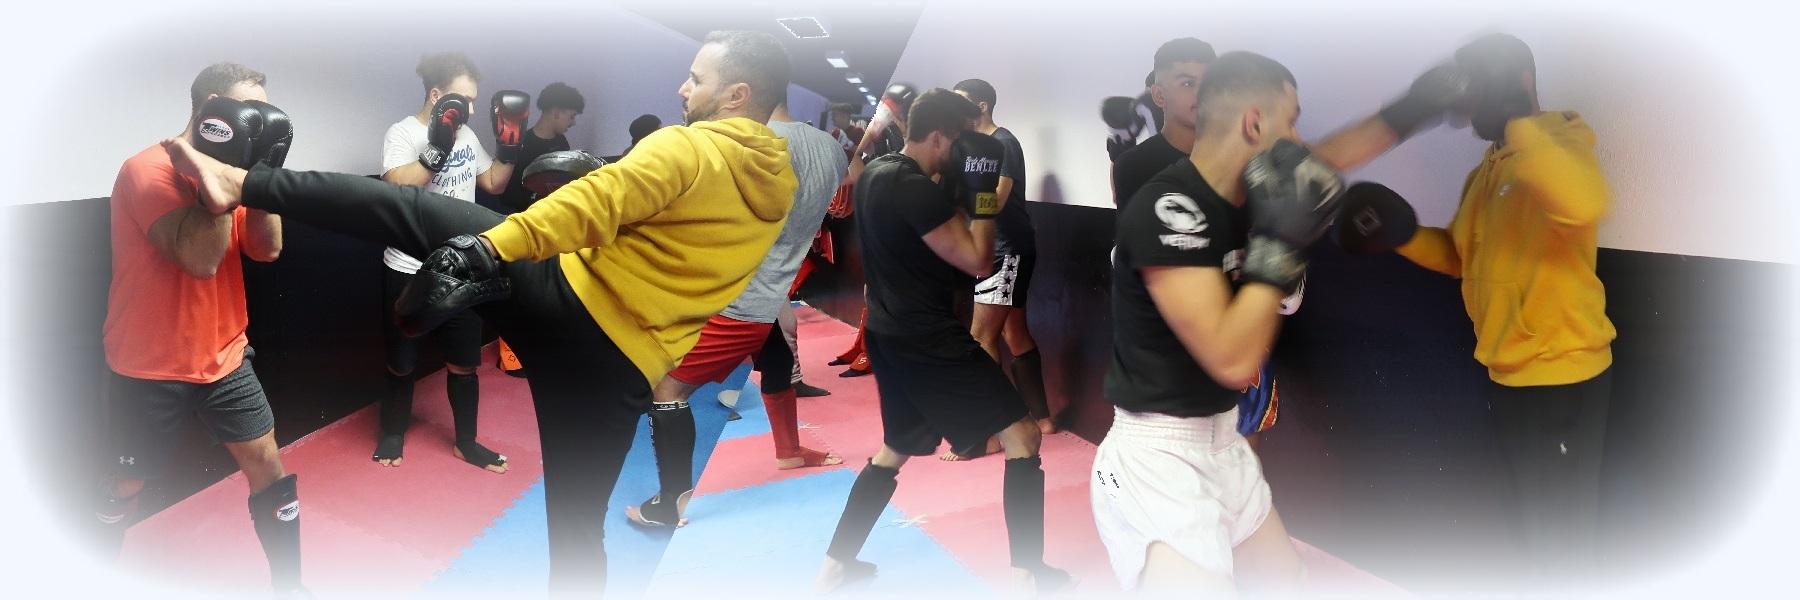 Kickboxen-Header-1